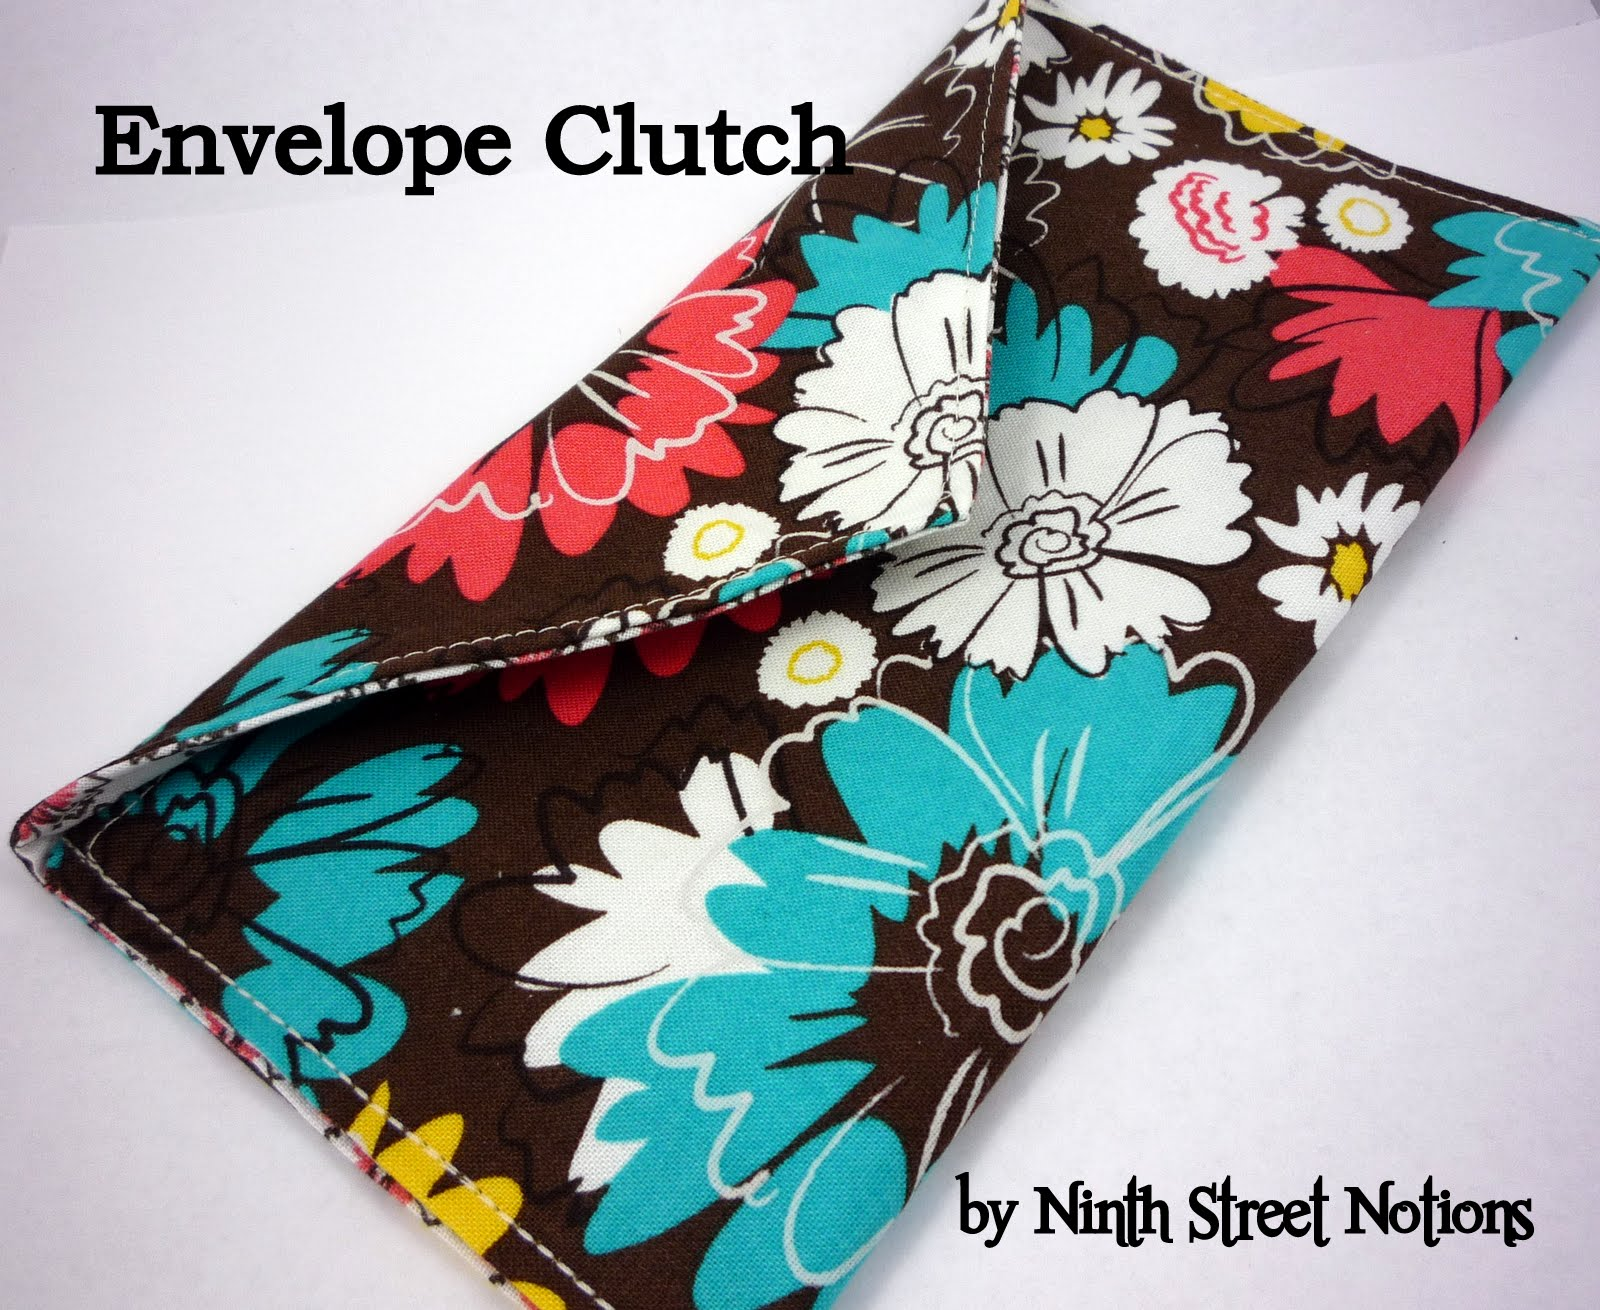 Envelope clutch purse nith street notions the csi project jeuxipadfo Gallery